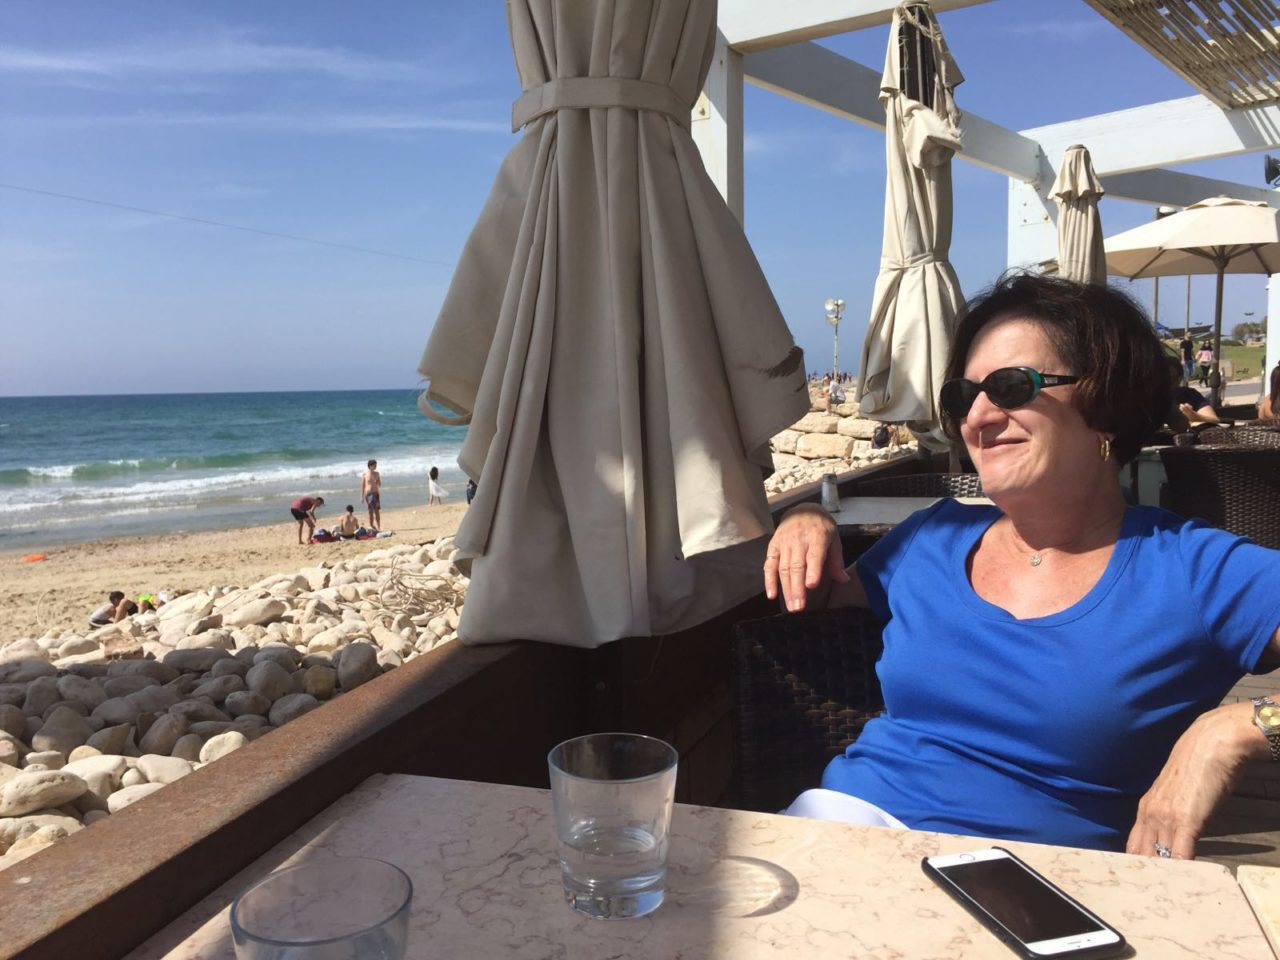 Vacationing in Israel ... Enjoying the view at Manta Ray Restaurant on the Tel Aviv Beach